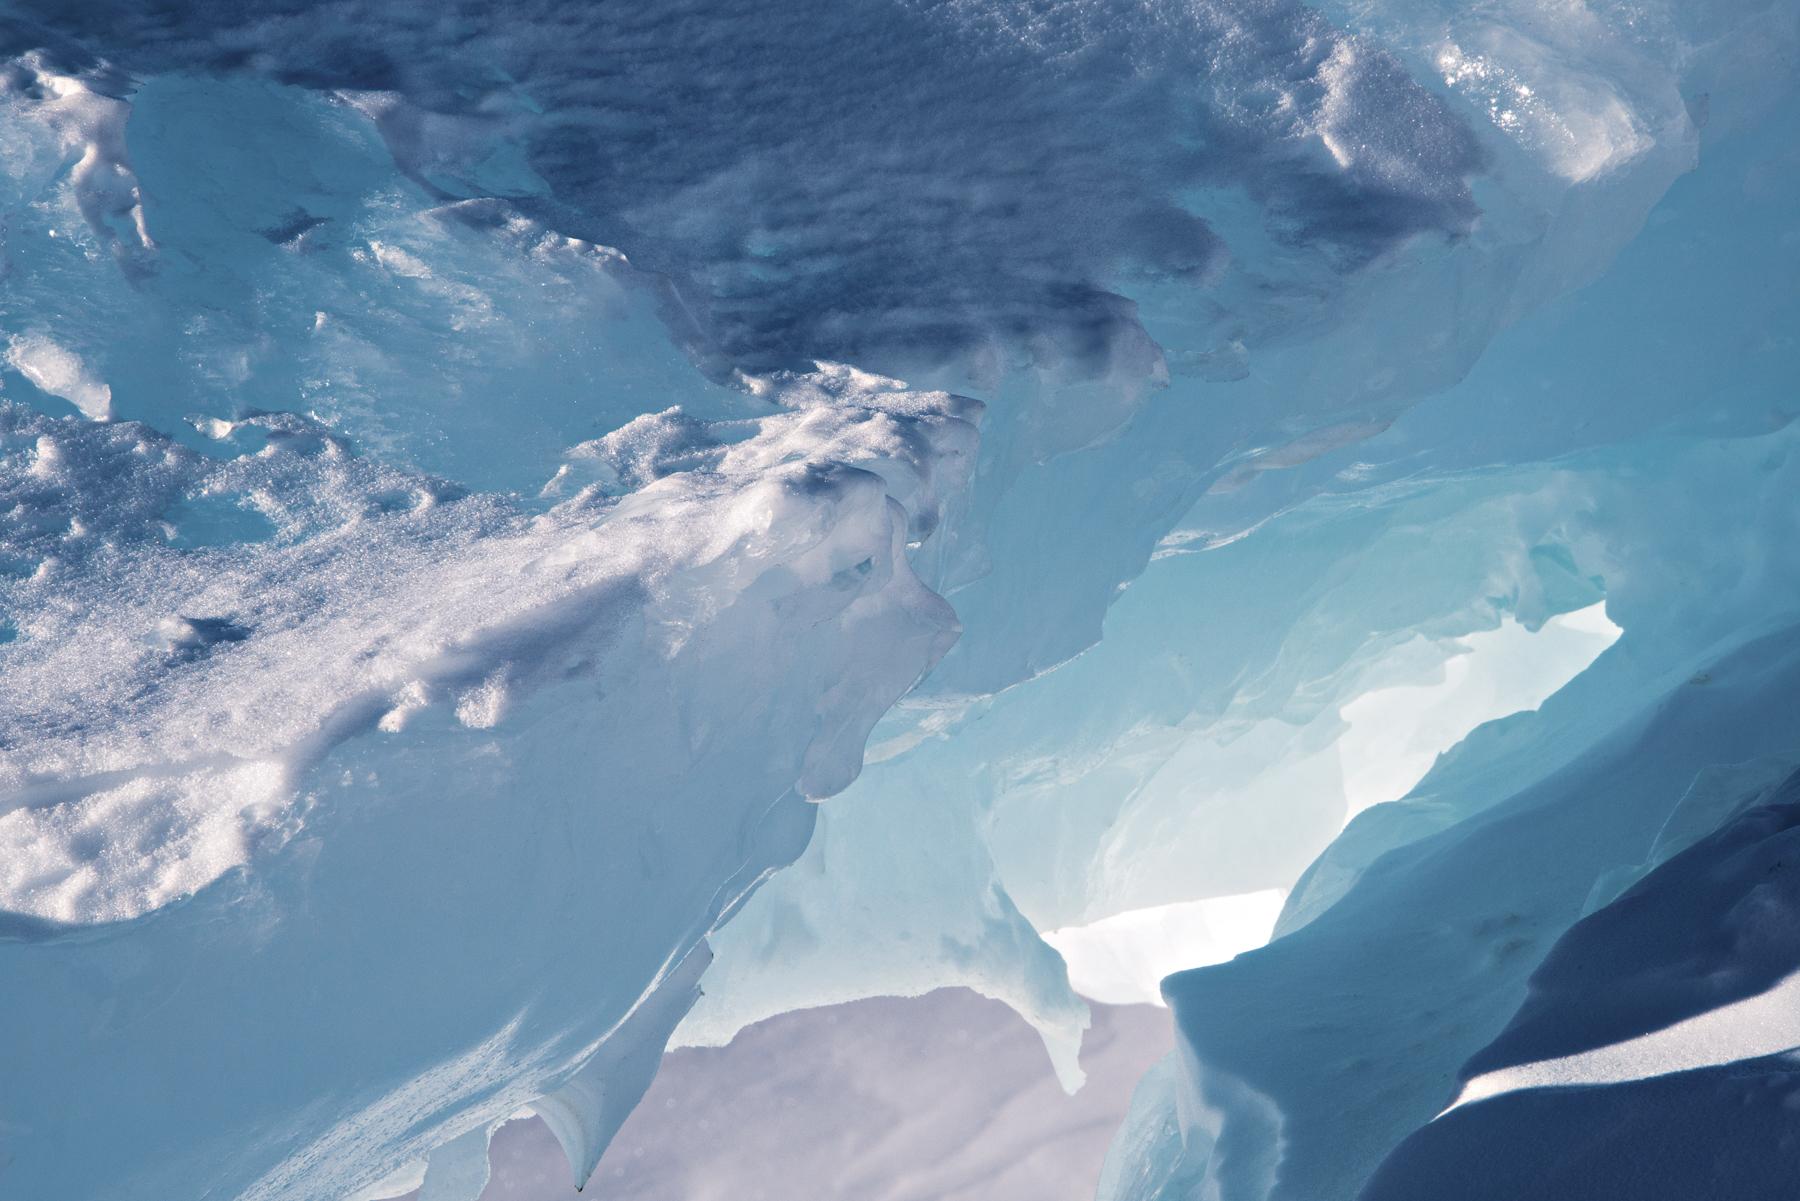 Ultraviolet Reflections, Scott Base Pressure Ridges